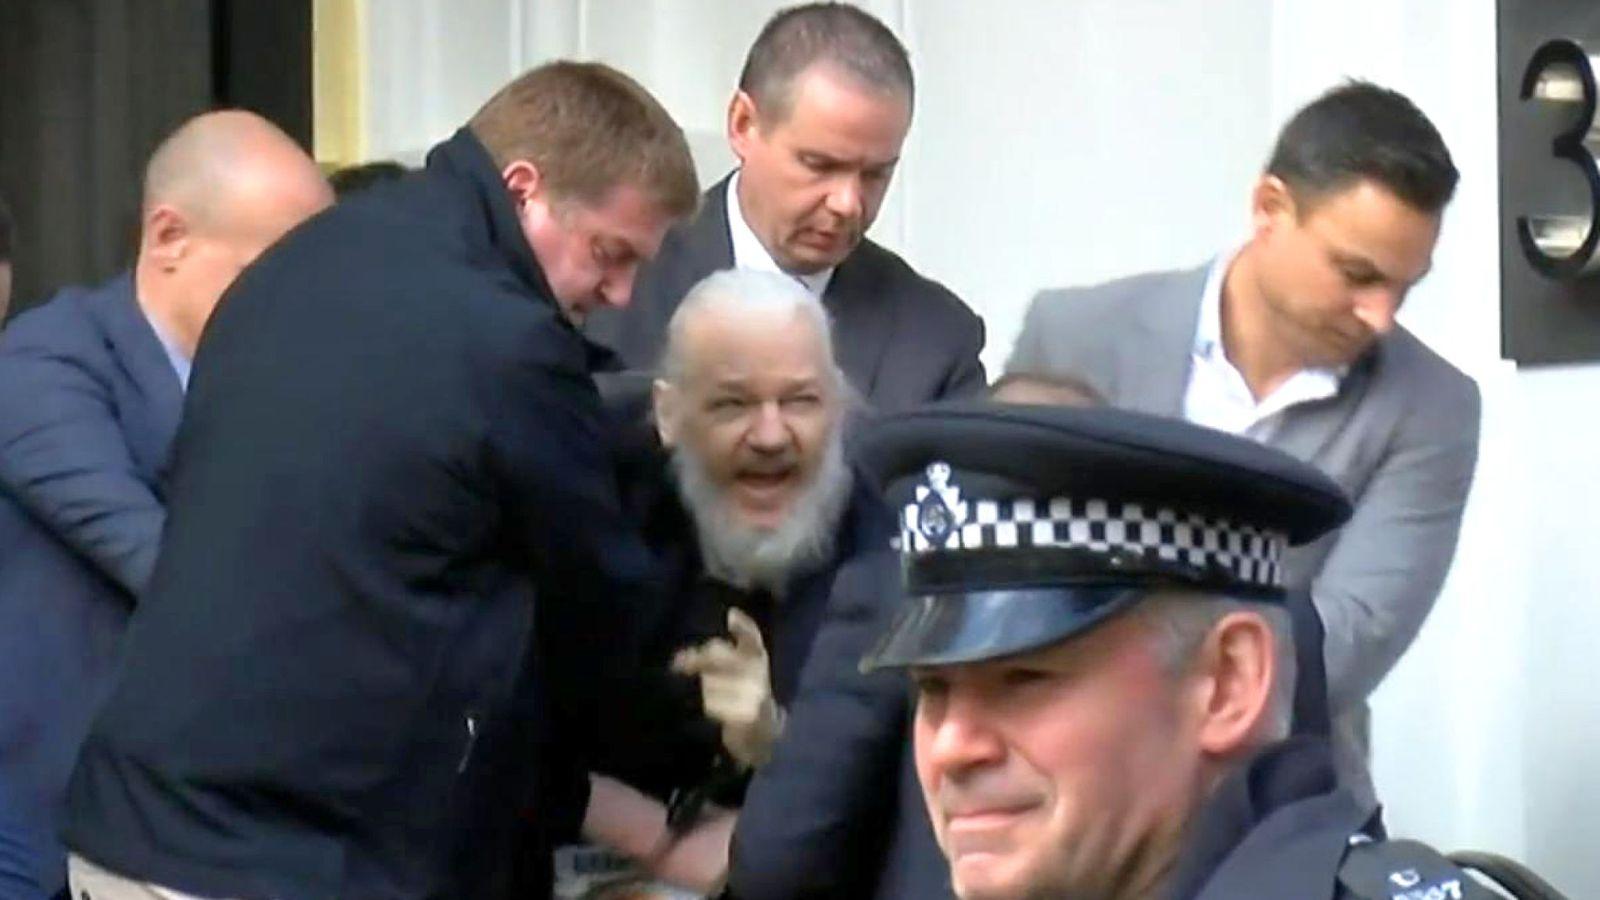 https://i2.wp.com/themillenniumreport.com/wp-content/uploads/2019/04/skynews-julian-assange-arrested_4635825.jpg